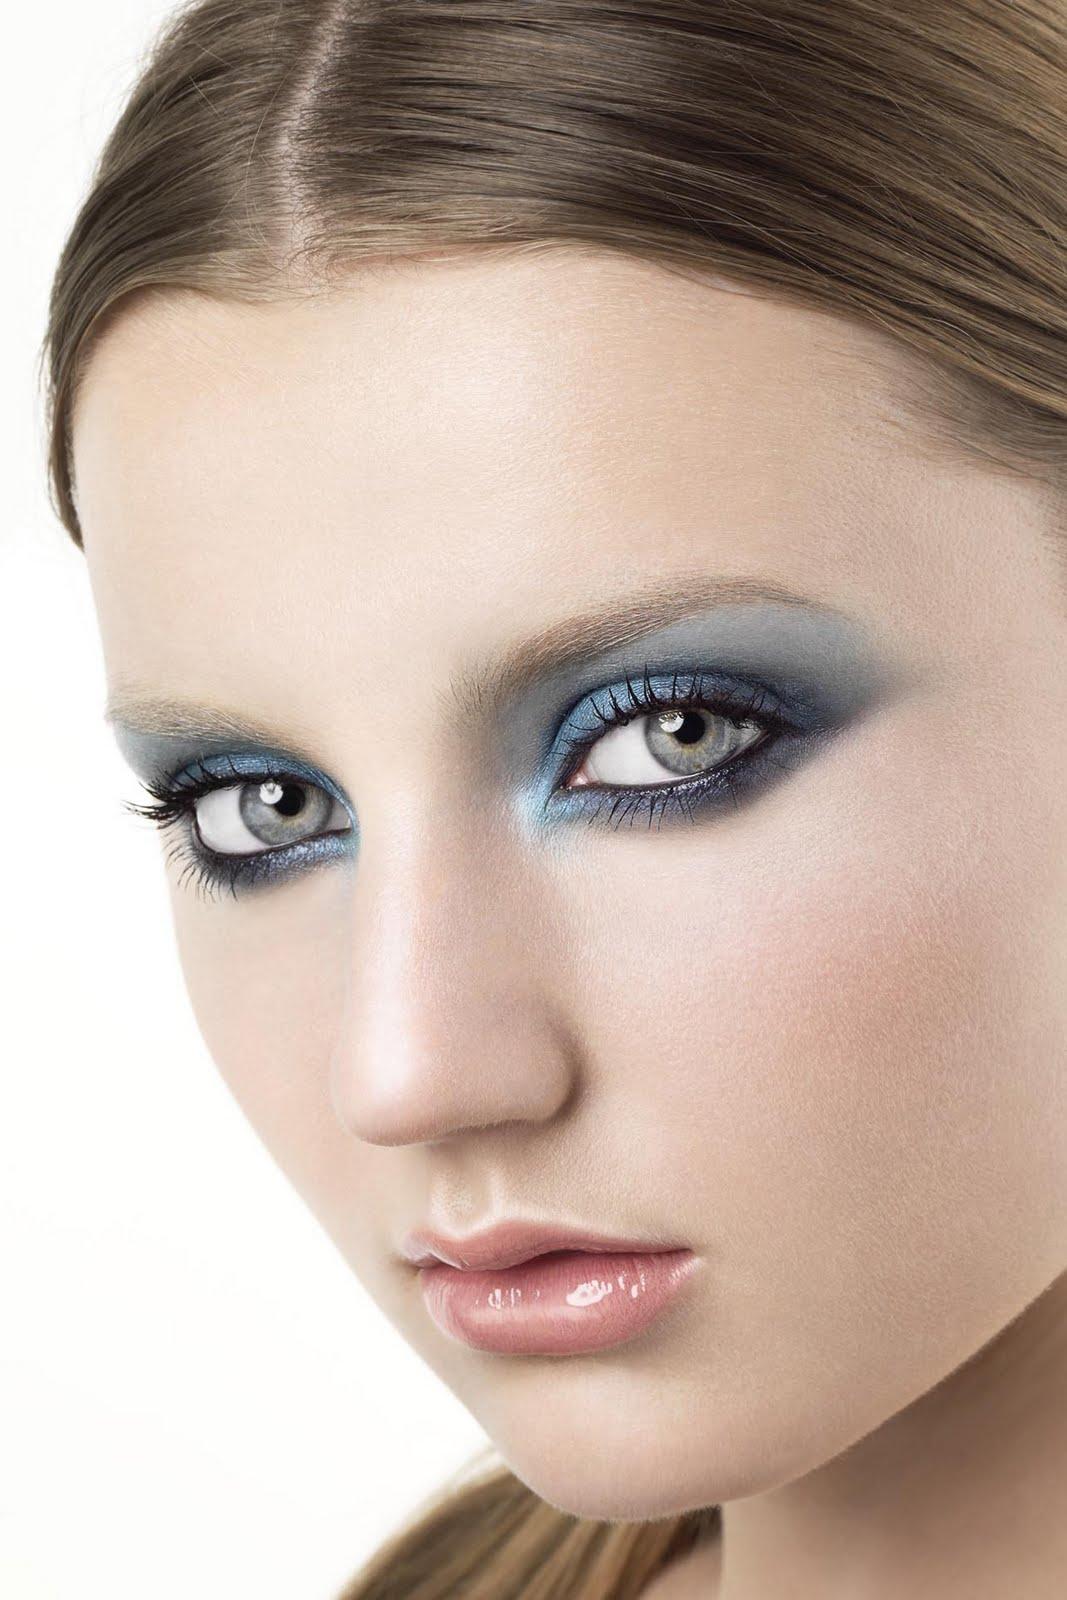 Girl with smoky eyes